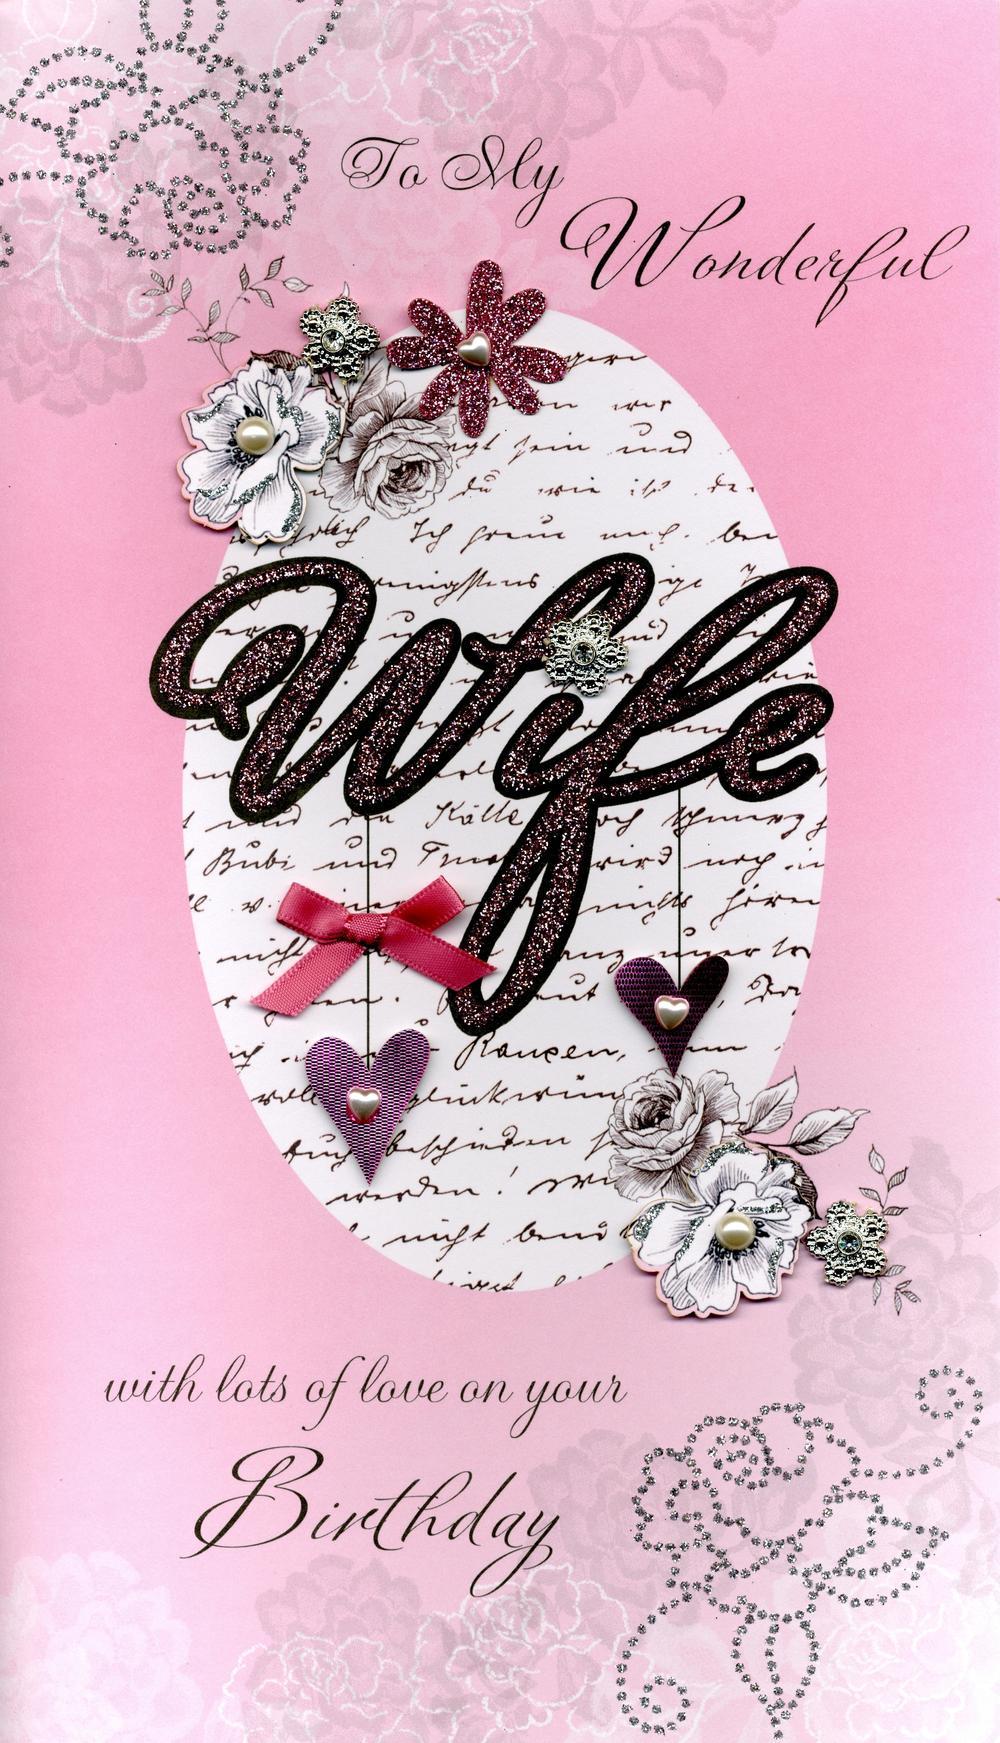 Boxed Wonderful Wife Embellished Birthday Greeting Card